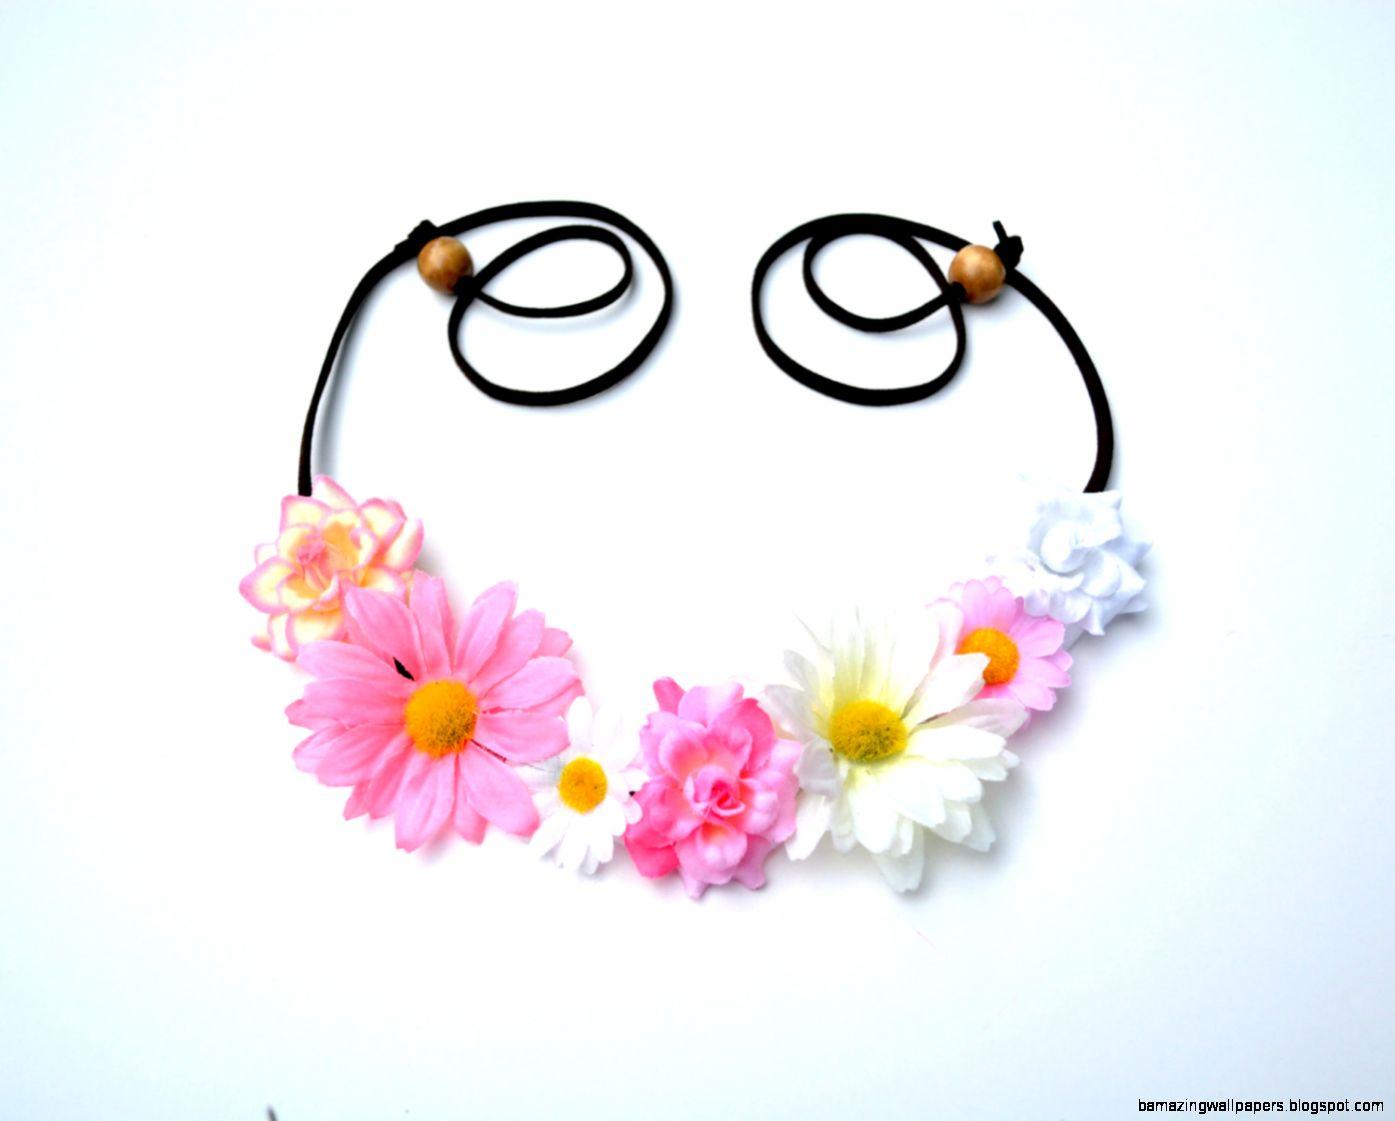 Daisy flower tumblr 96516 movieweb daisy flower tumblr izmirmasajfo